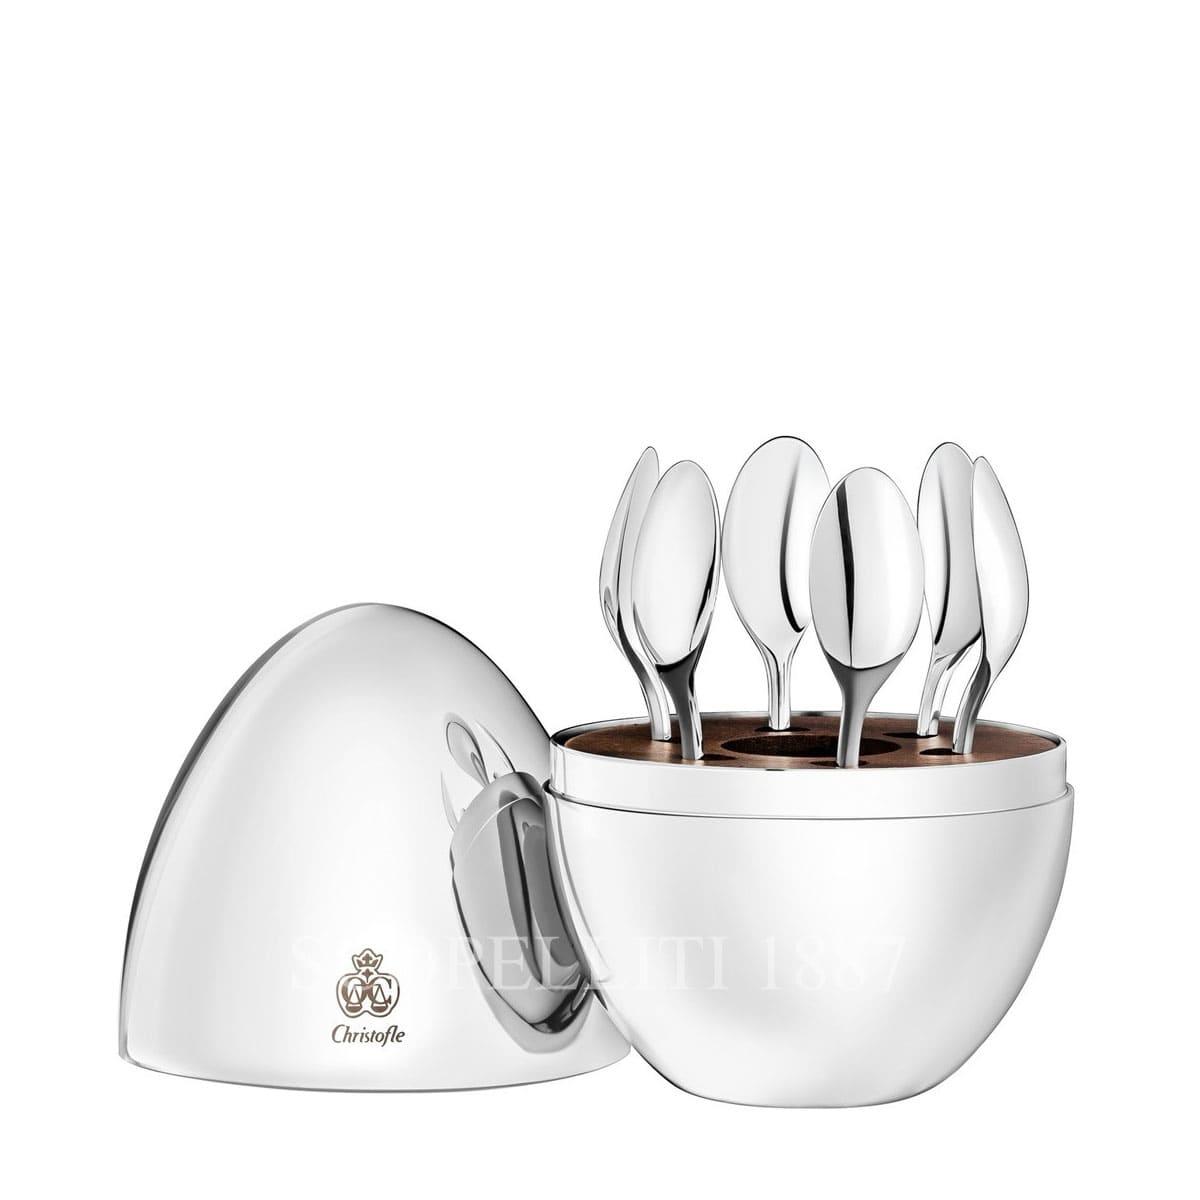 Elegance Silver Coffee Scoop Silver Plated